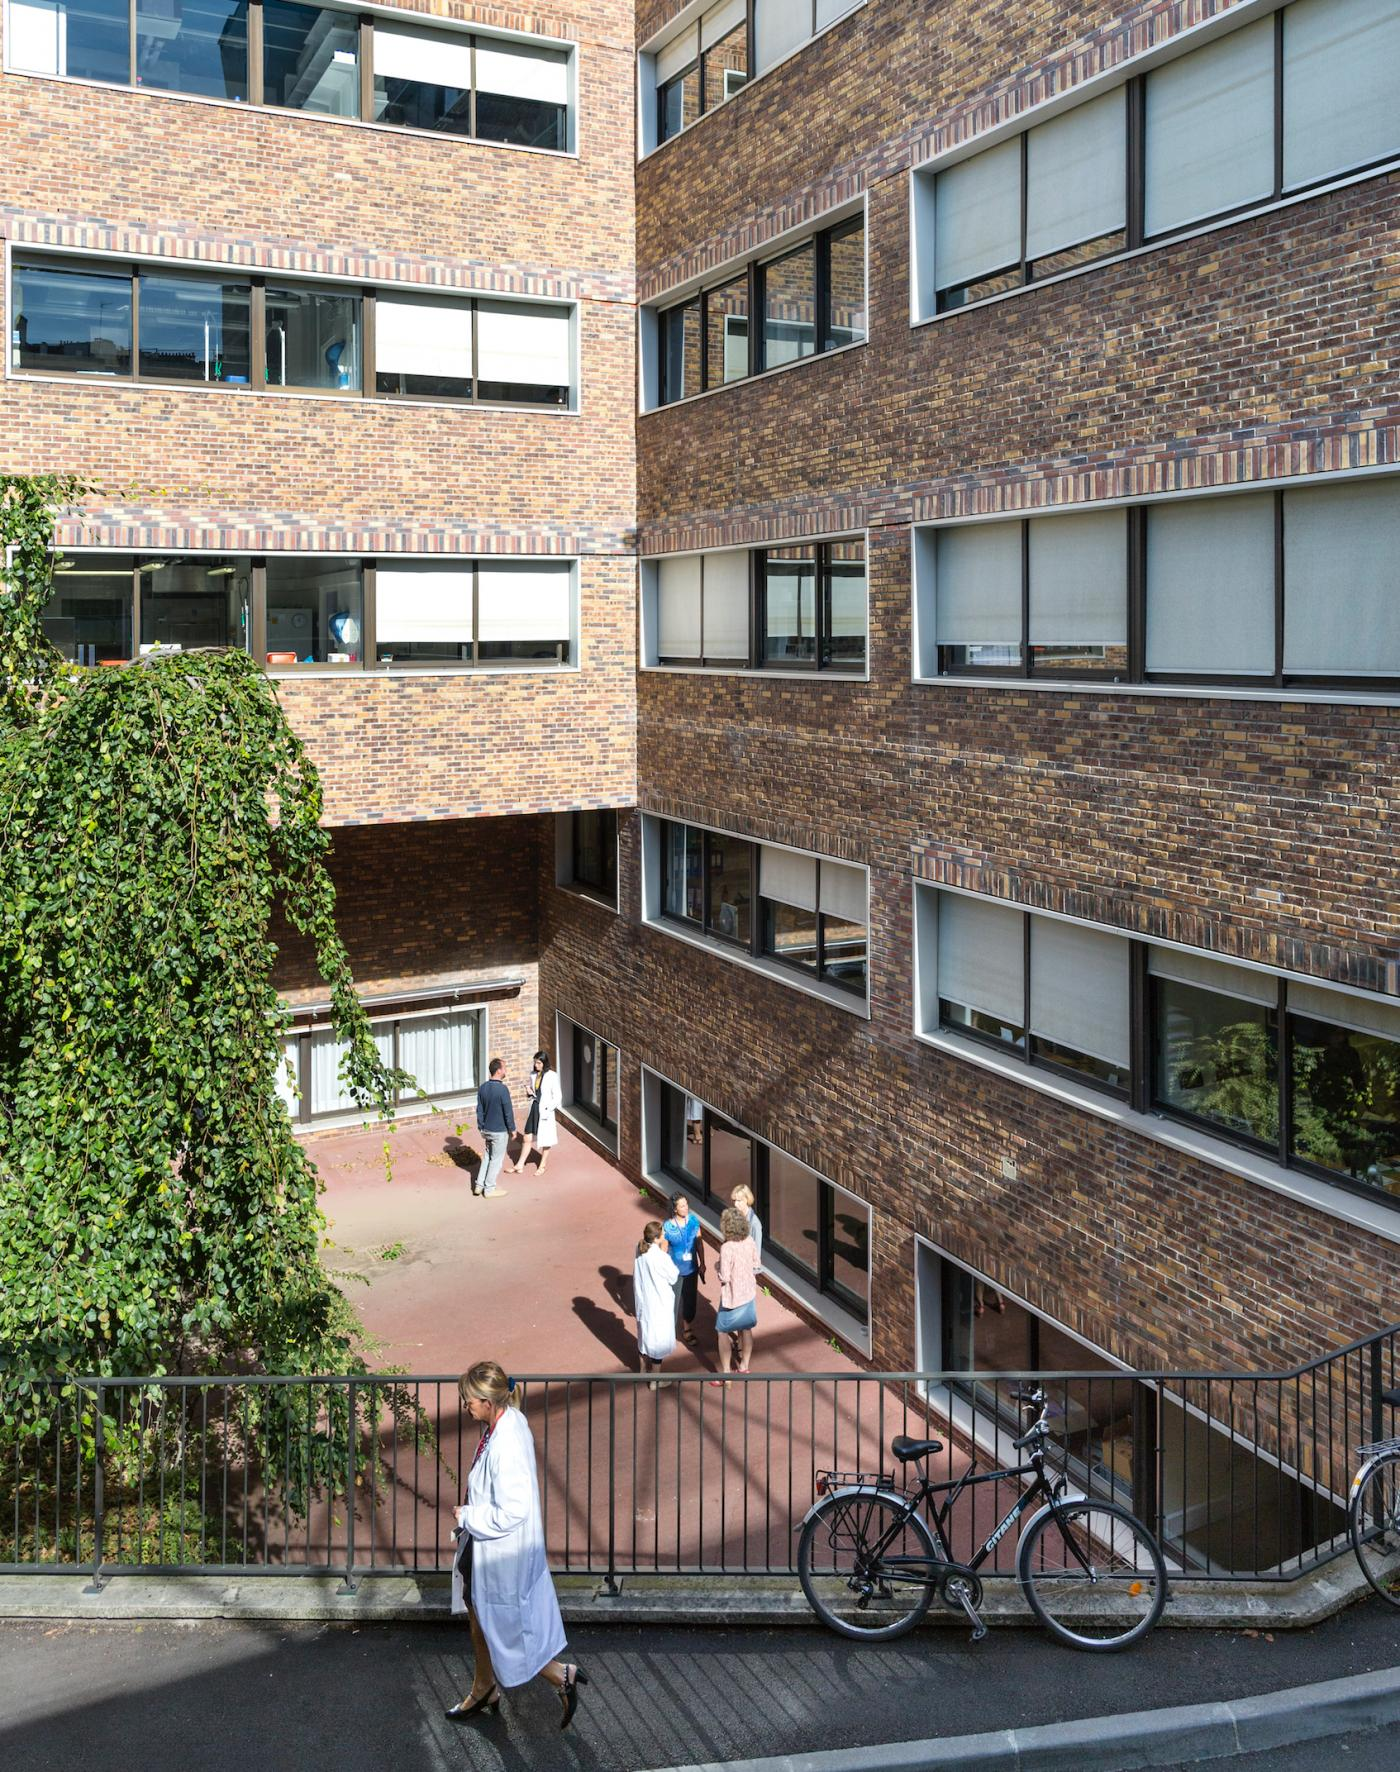 Bâtiment Metchnikoff - Institut Pasteur